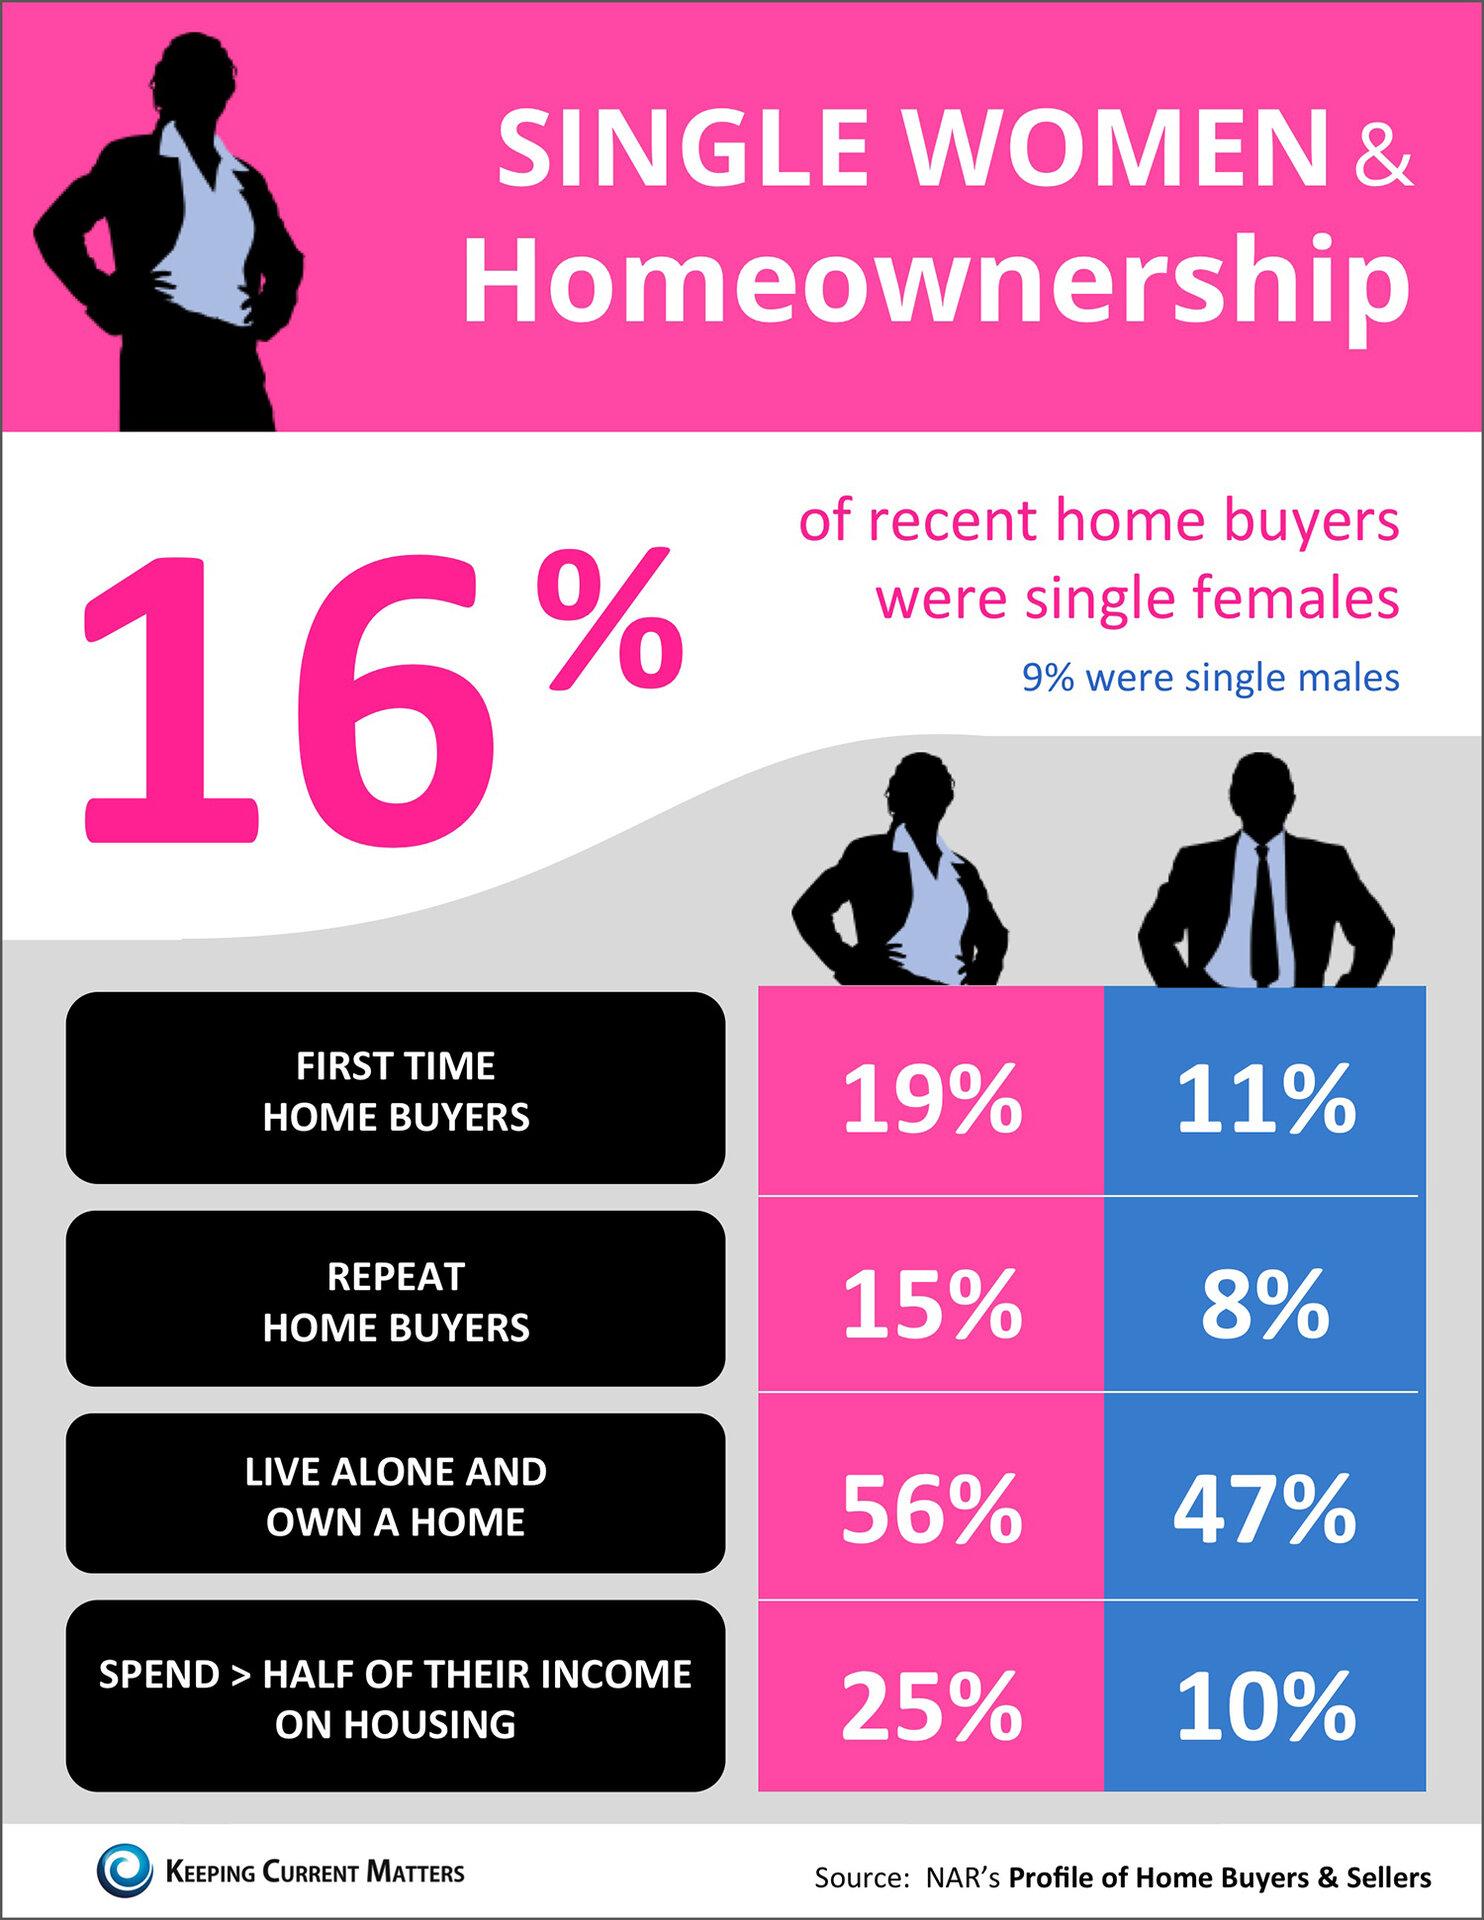 Single Women and Homeownership